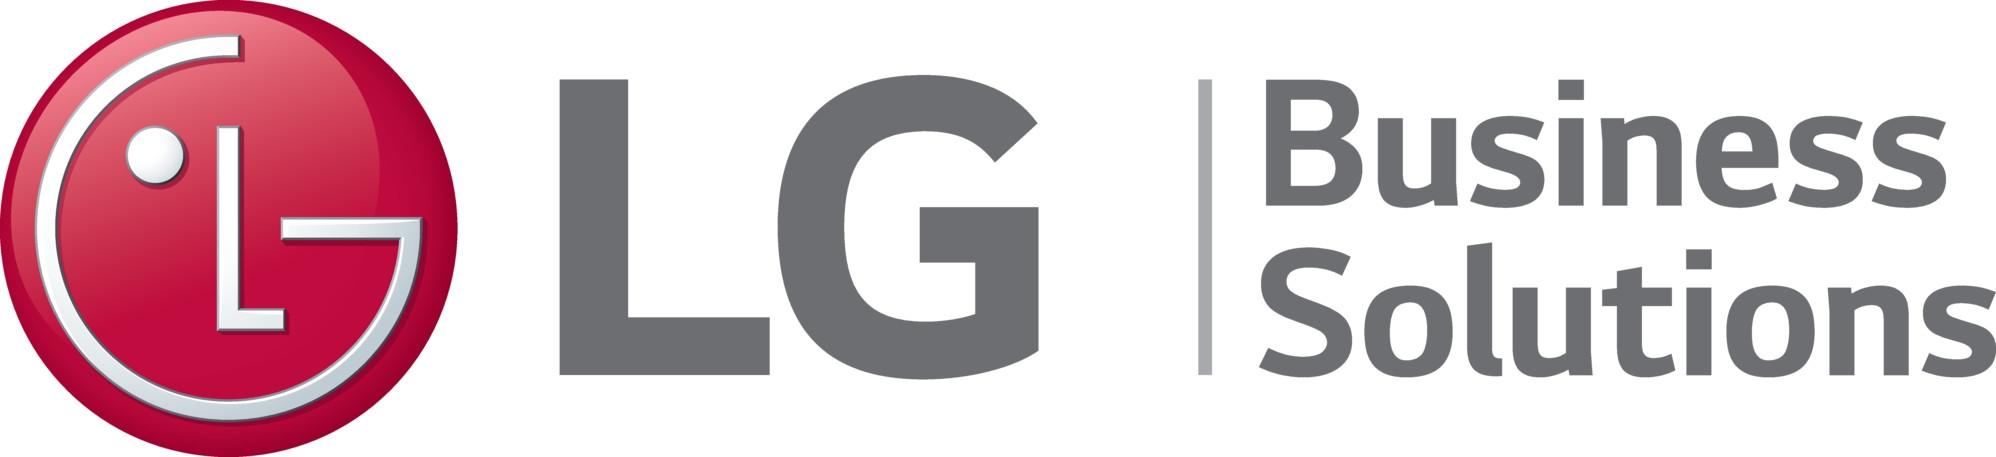 LG Business Solutions_logo.jpg